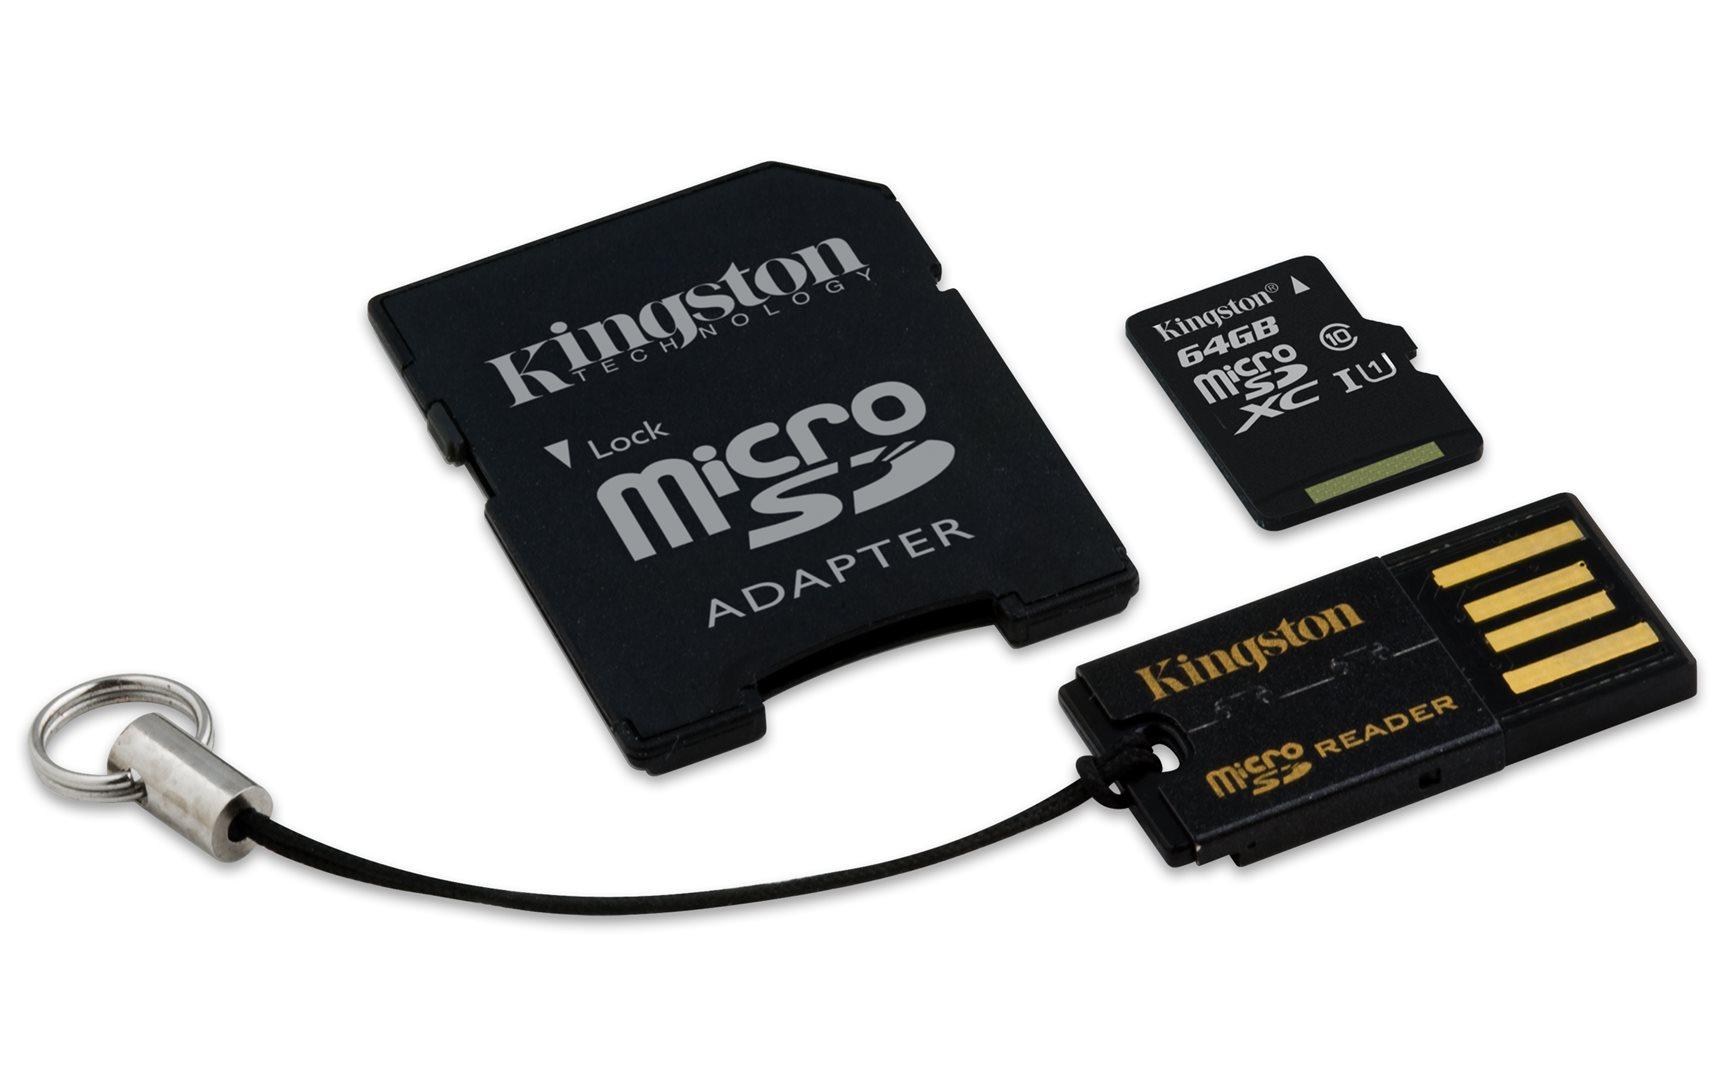 Kingston 64GB Mobility Kit G2 class 10